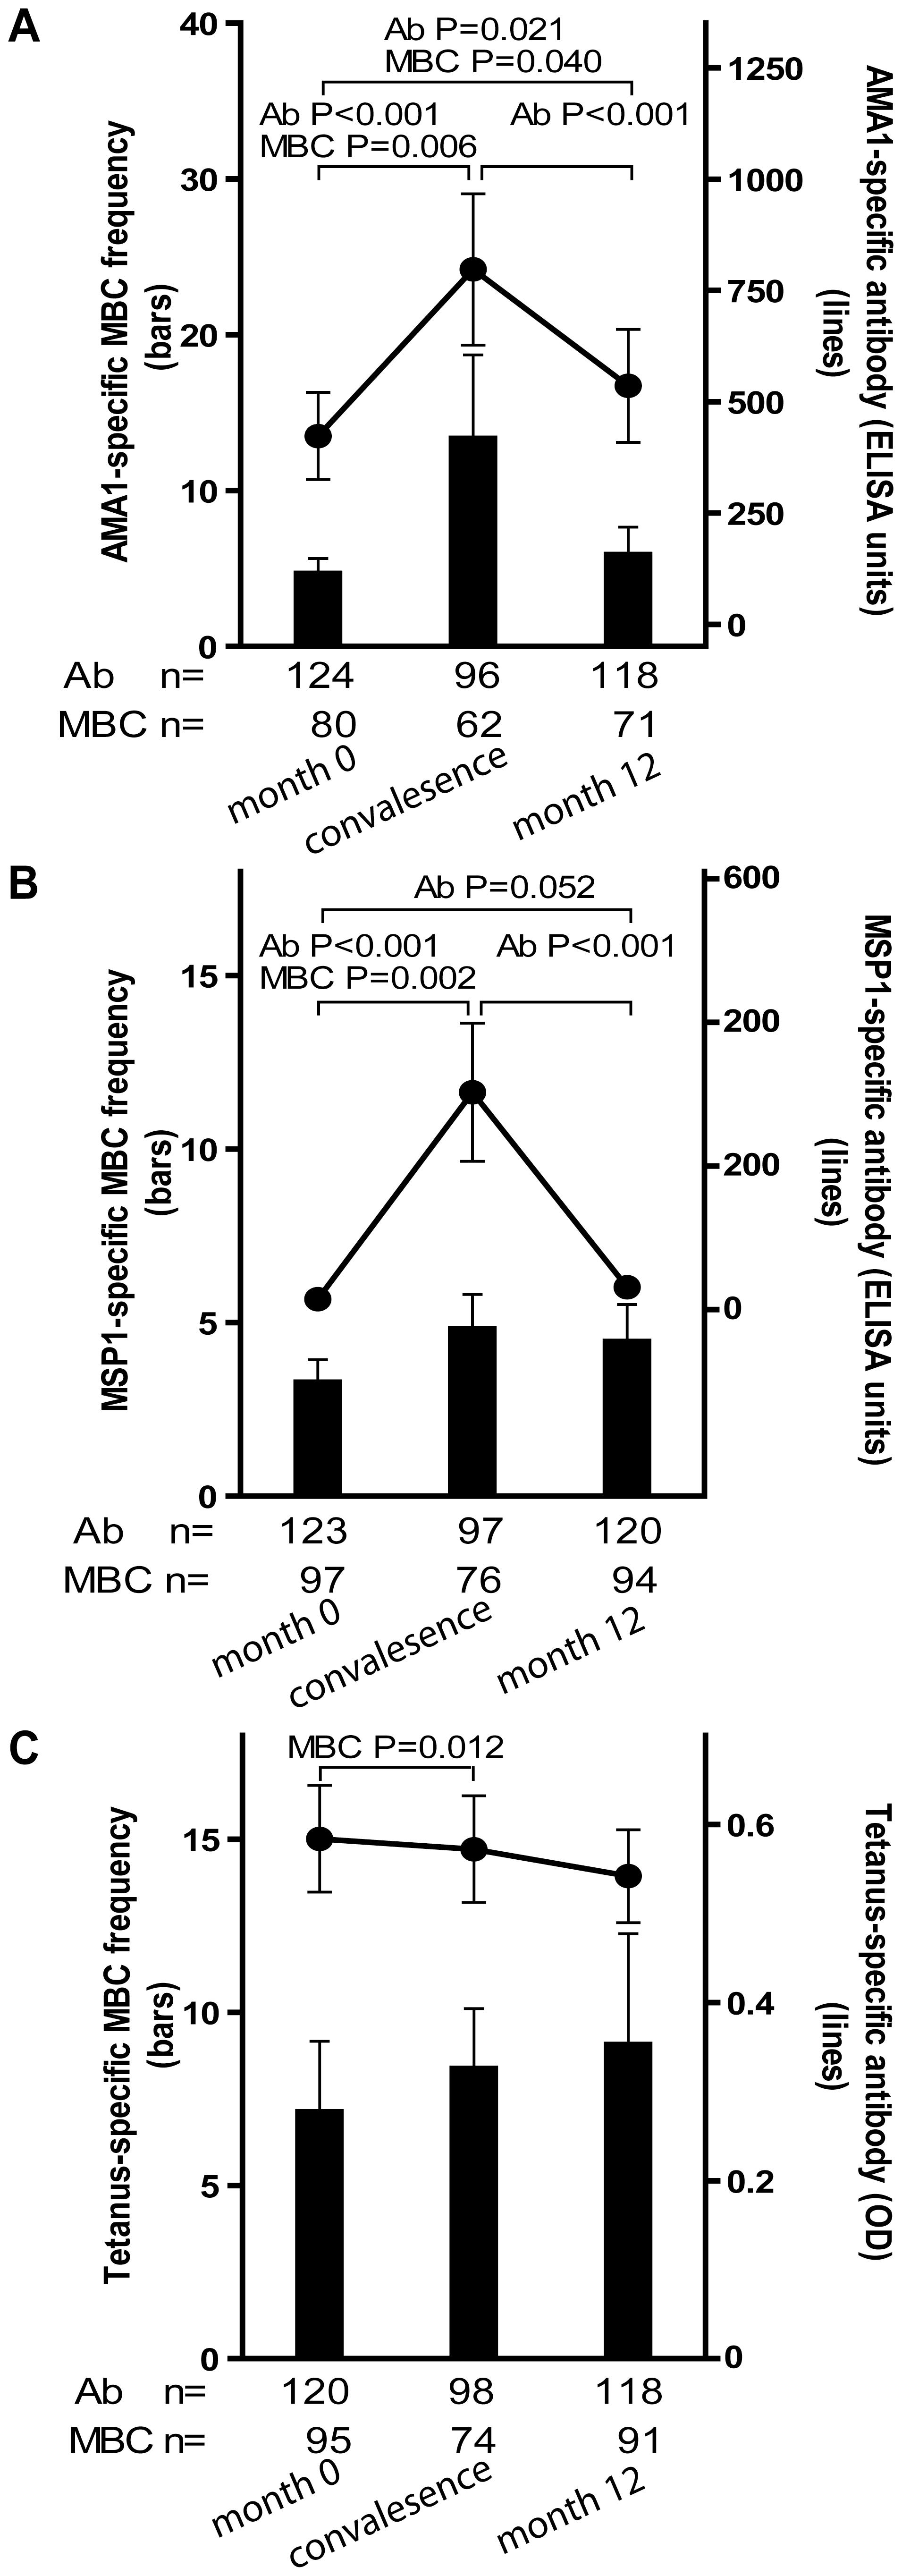 Longitudinal analysis of the <i>Pf</i>- and TT-specific MBC and antibody response.